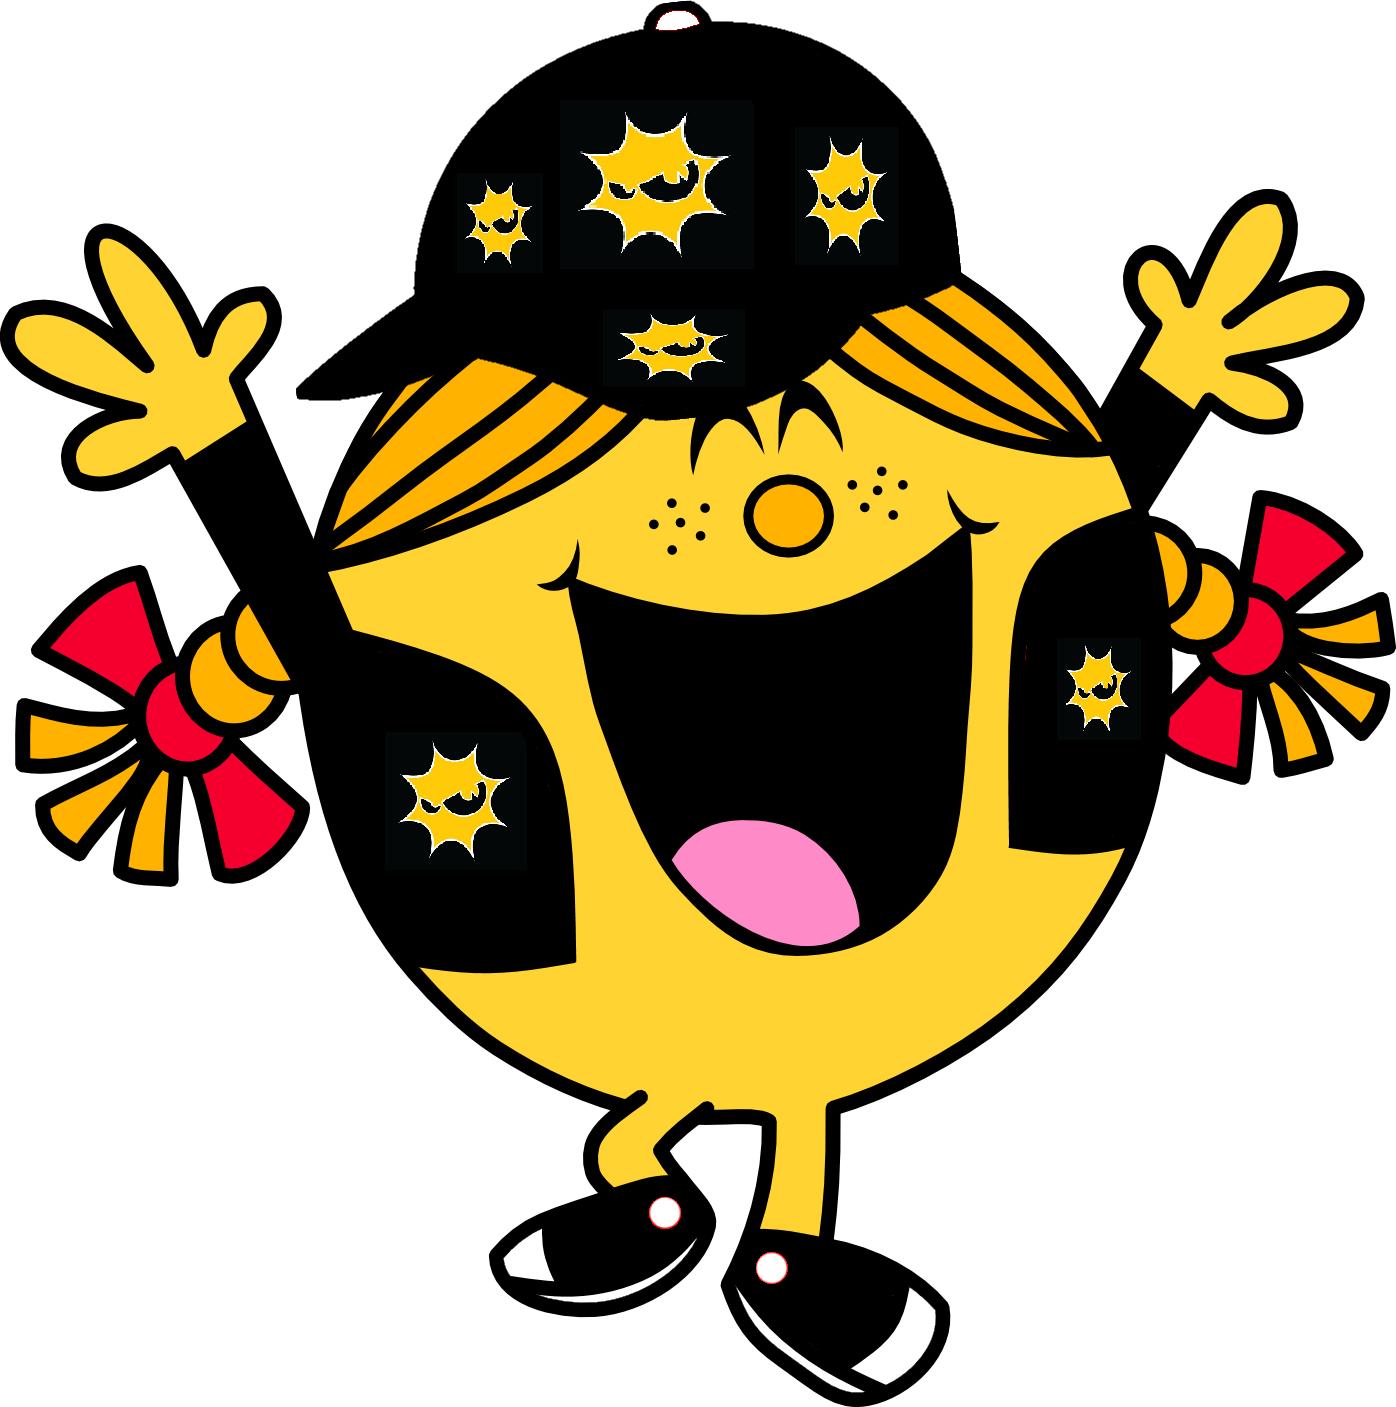 Little-Miss-Sunshine-Goes-Wild-the-mr-men-show-38161950-1396-1407